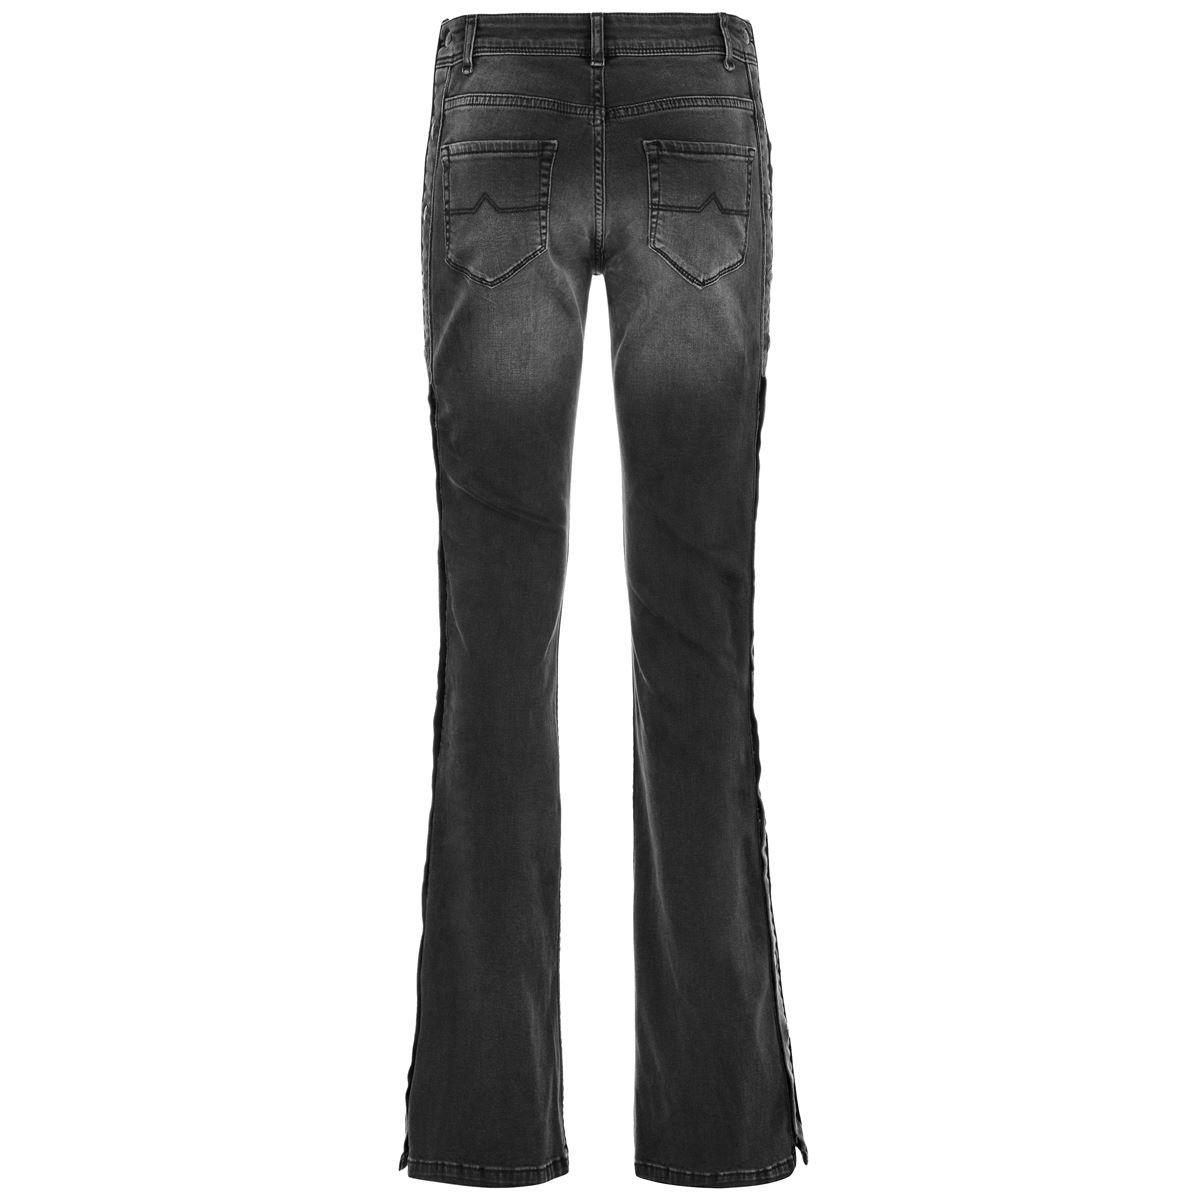 jeans kappa KAPPA   Jeans   304ITK0906